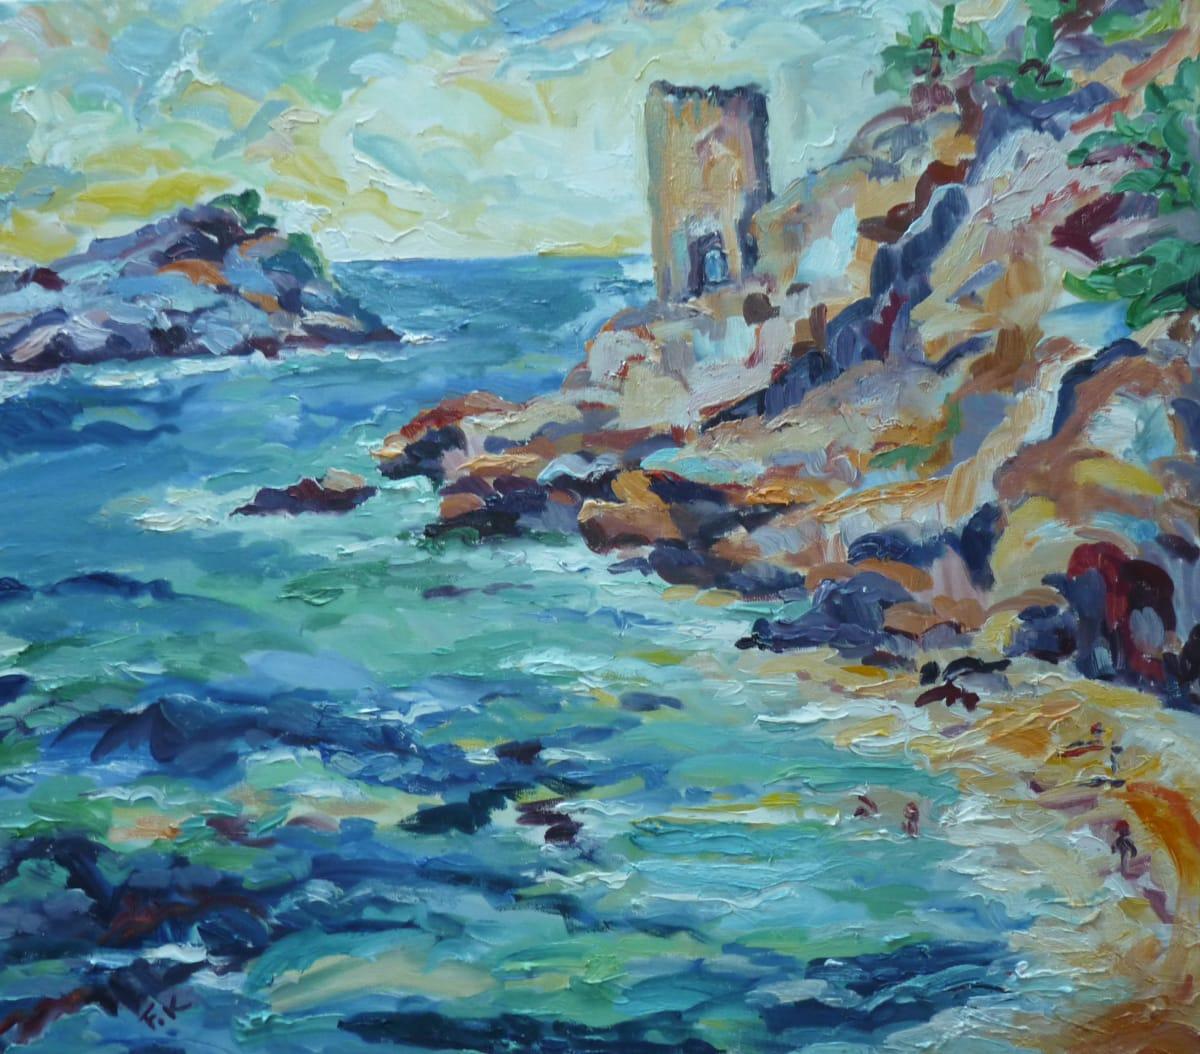 Fi Katzler CALANQUE DE LA COTE BLEUE Oil on canvas 26 x 29 in. 66.04 x 73.66 cm